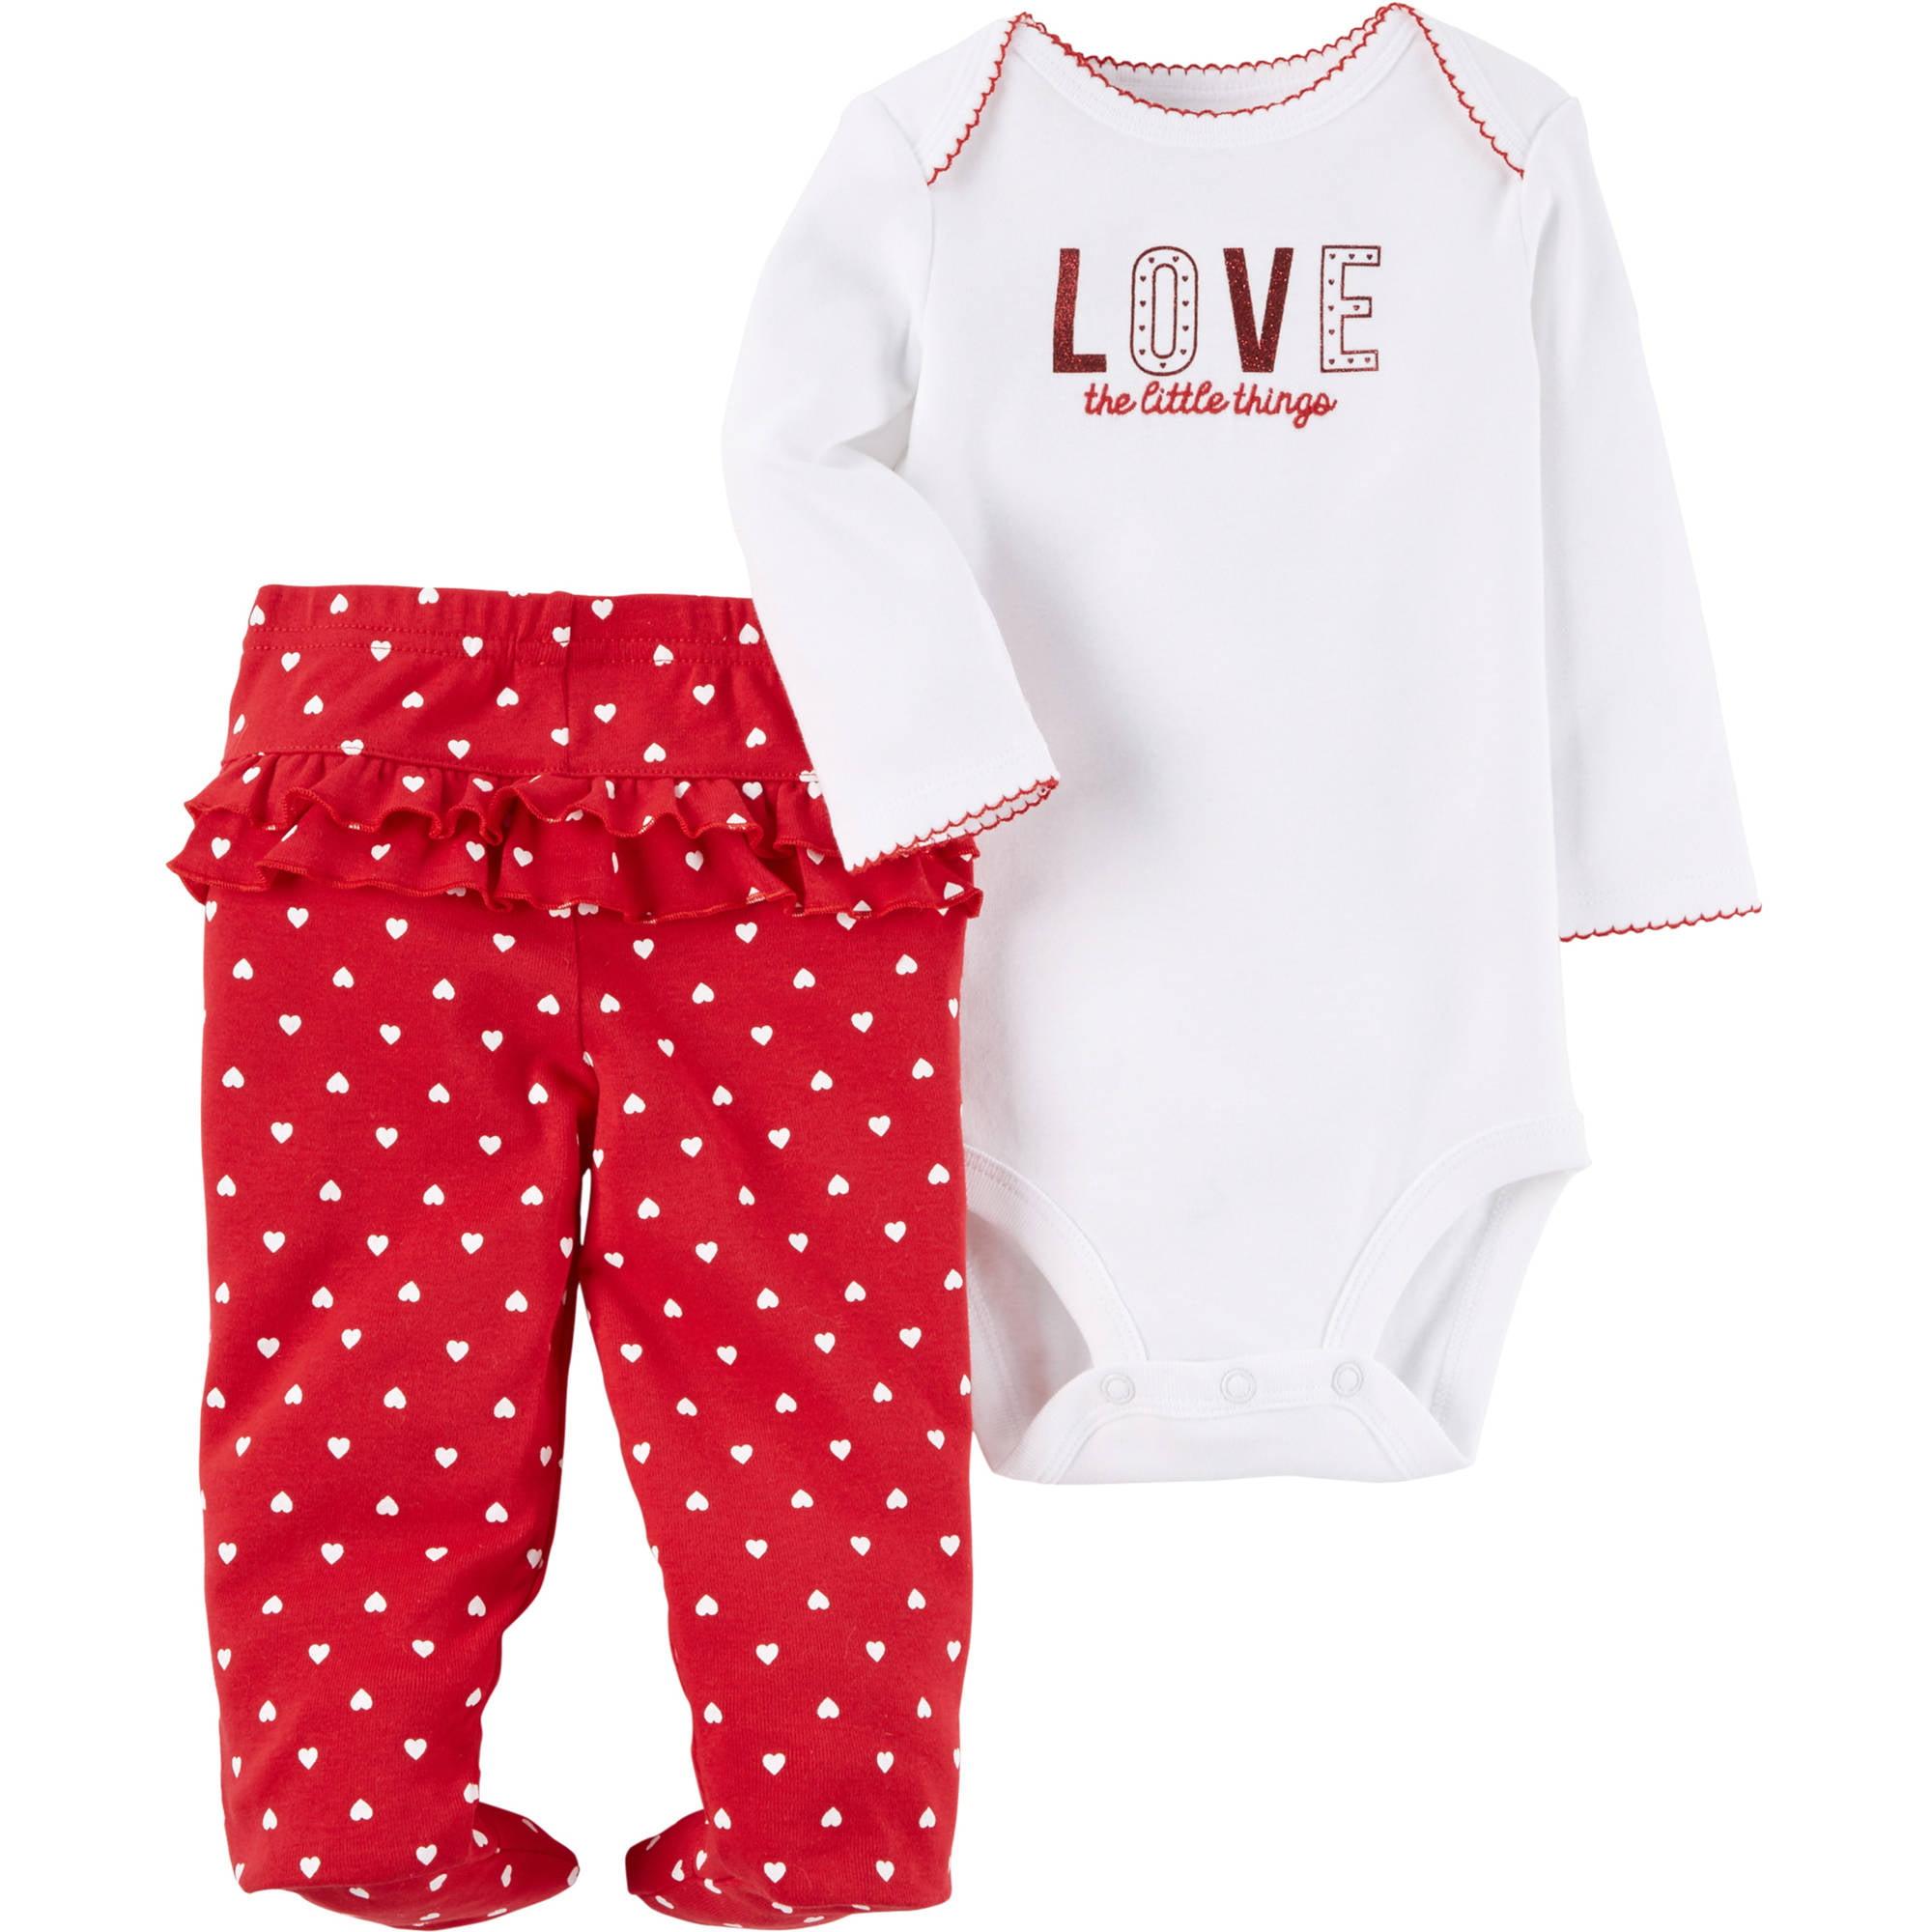 e025fc7e89a0 Child of Mine by Carter s - Com Valentines Bodysuit Set Girl ...